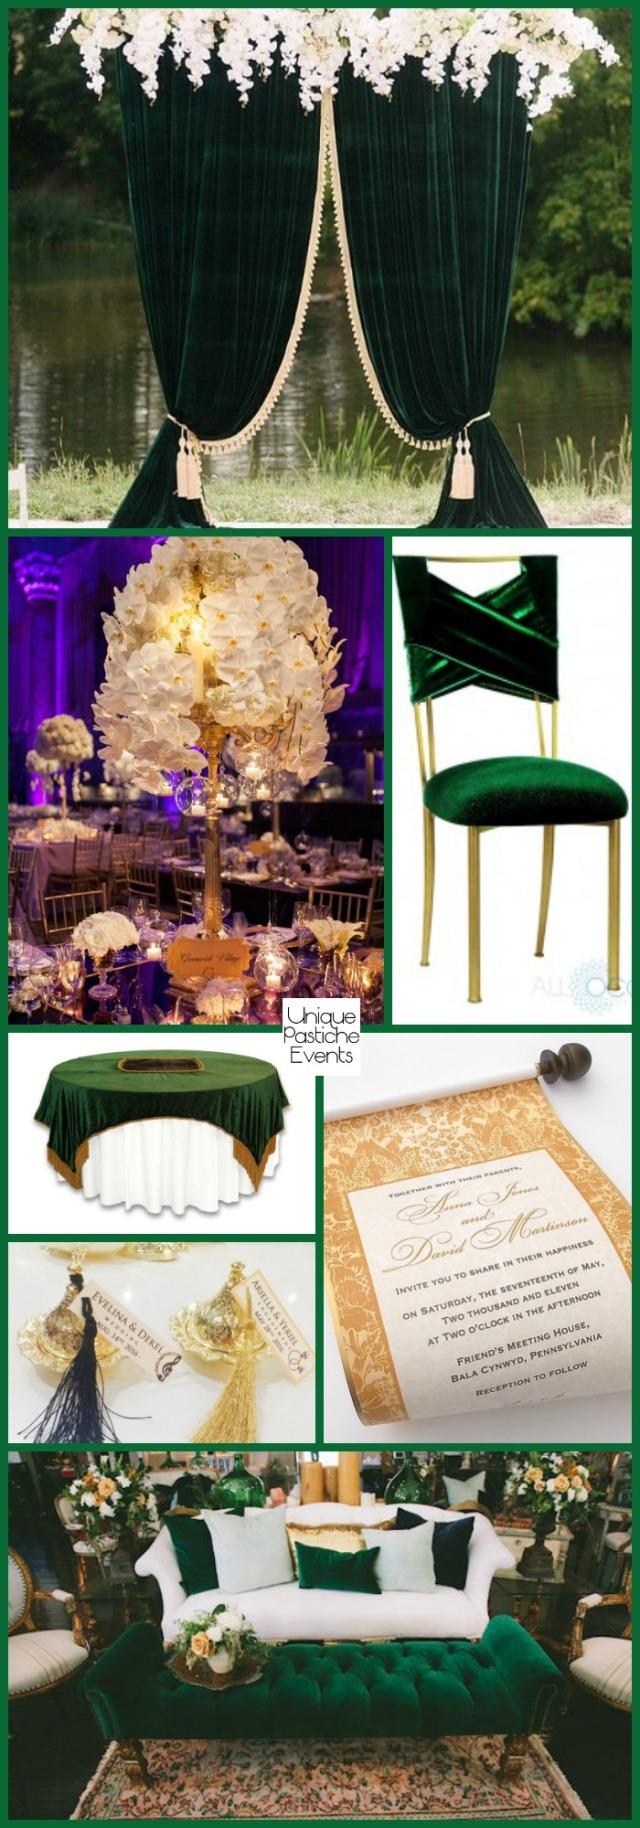 Sophisticated Green Velvet Winter Wedding Decor with Gold